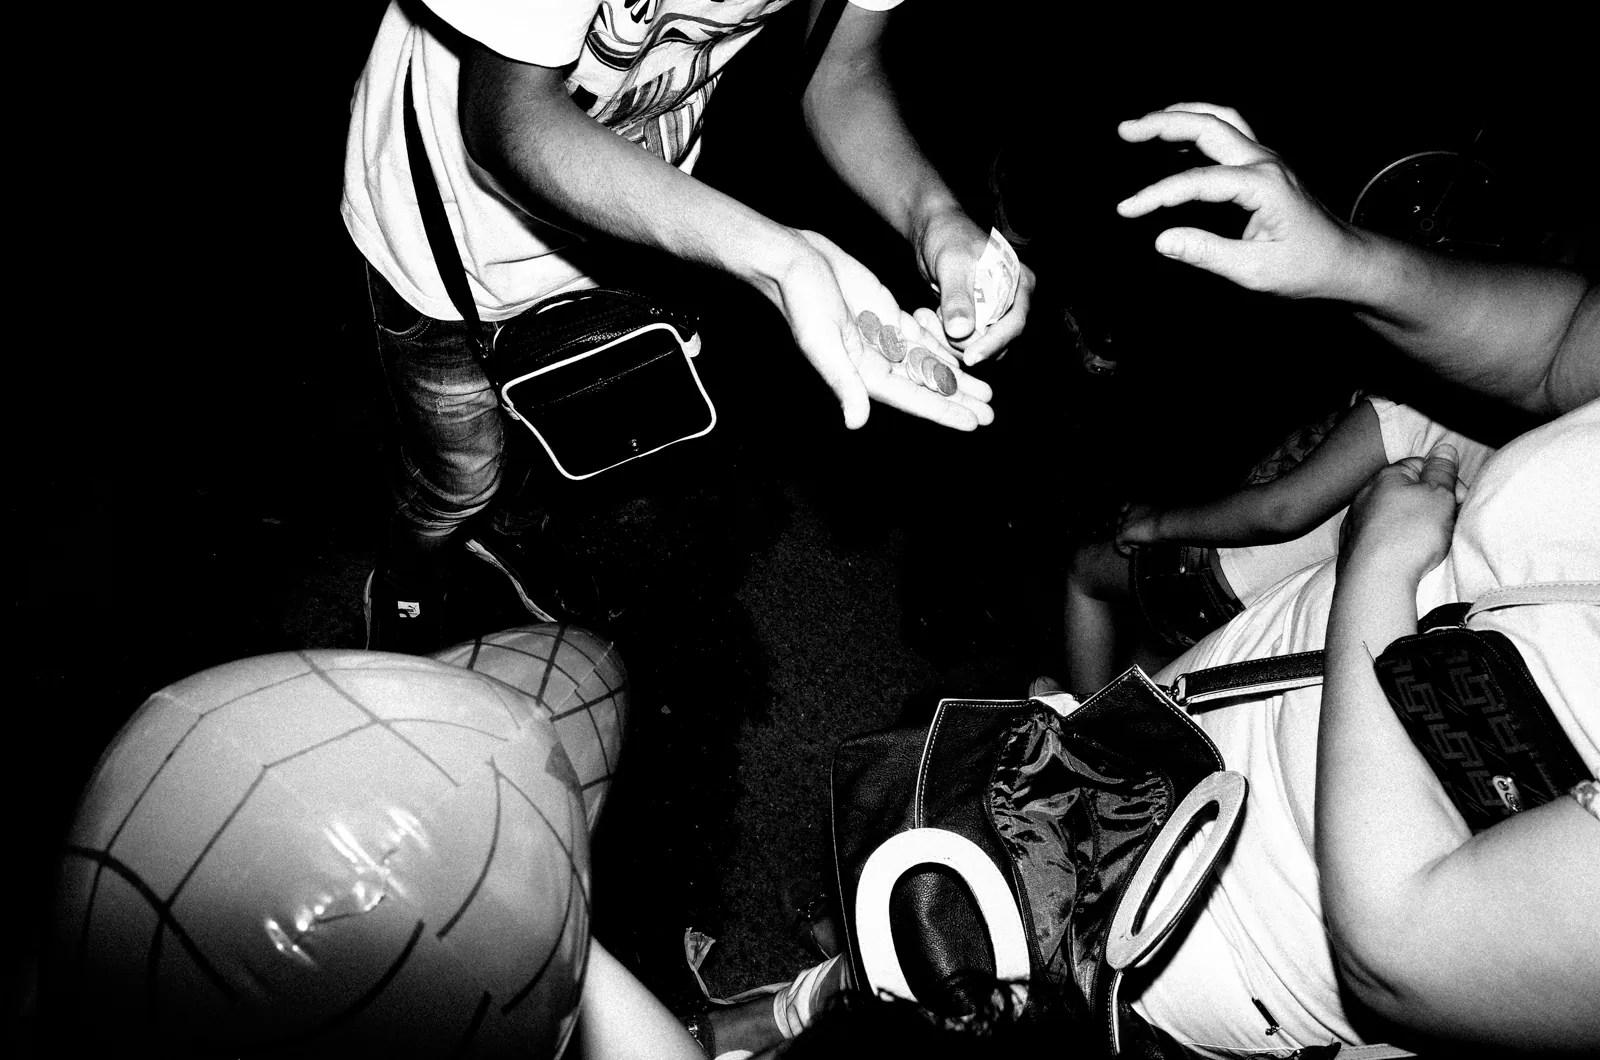 R0020026 - Una Istintiva Sessione Notturna • Street Photography Night Session a Palagonia - Sicilia - fotostreet.it